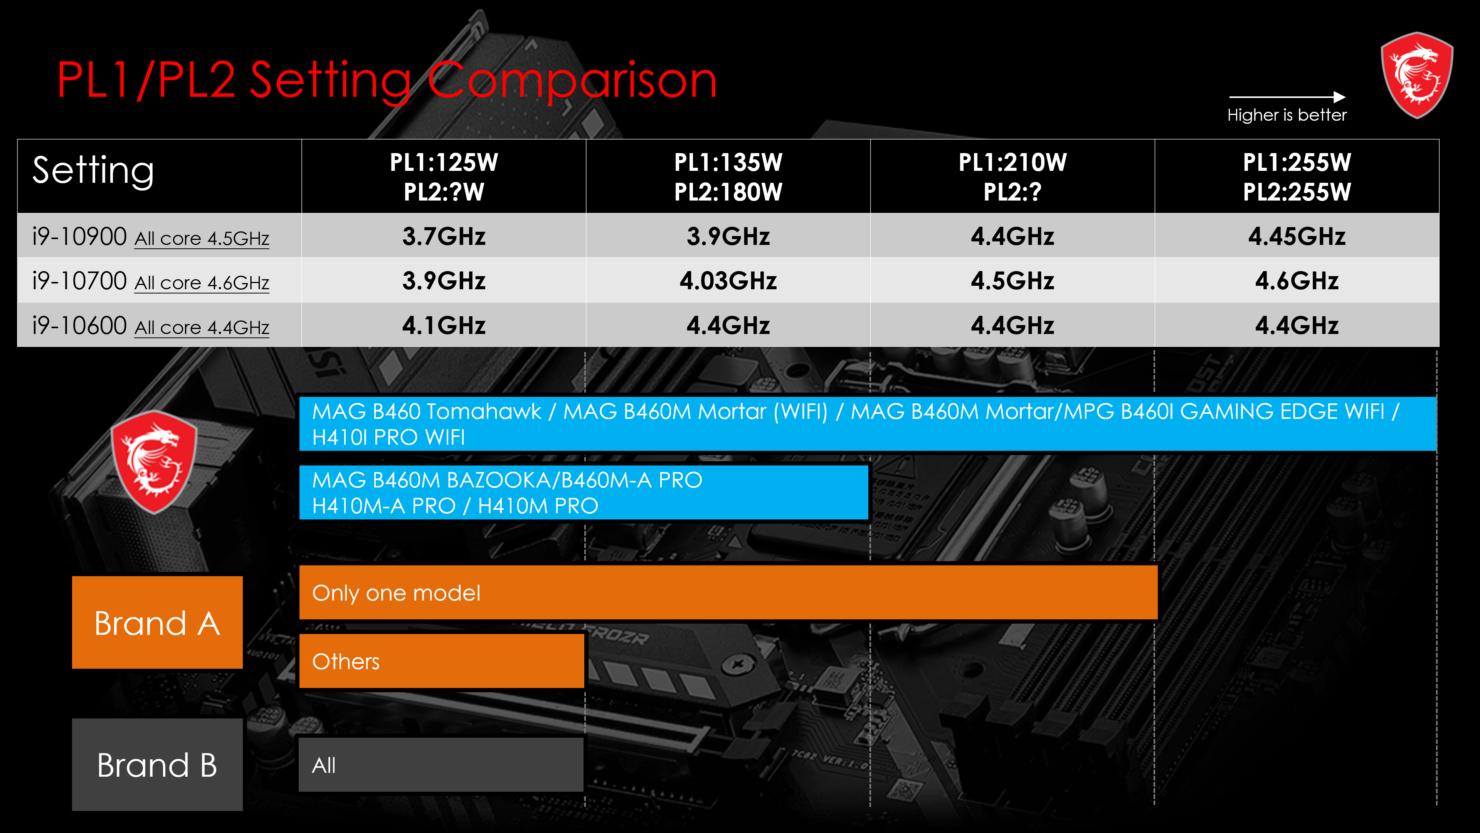 msi-non-k-cpu-overclock_b460_h410_motherboards_10th-gen-comet-lake_5